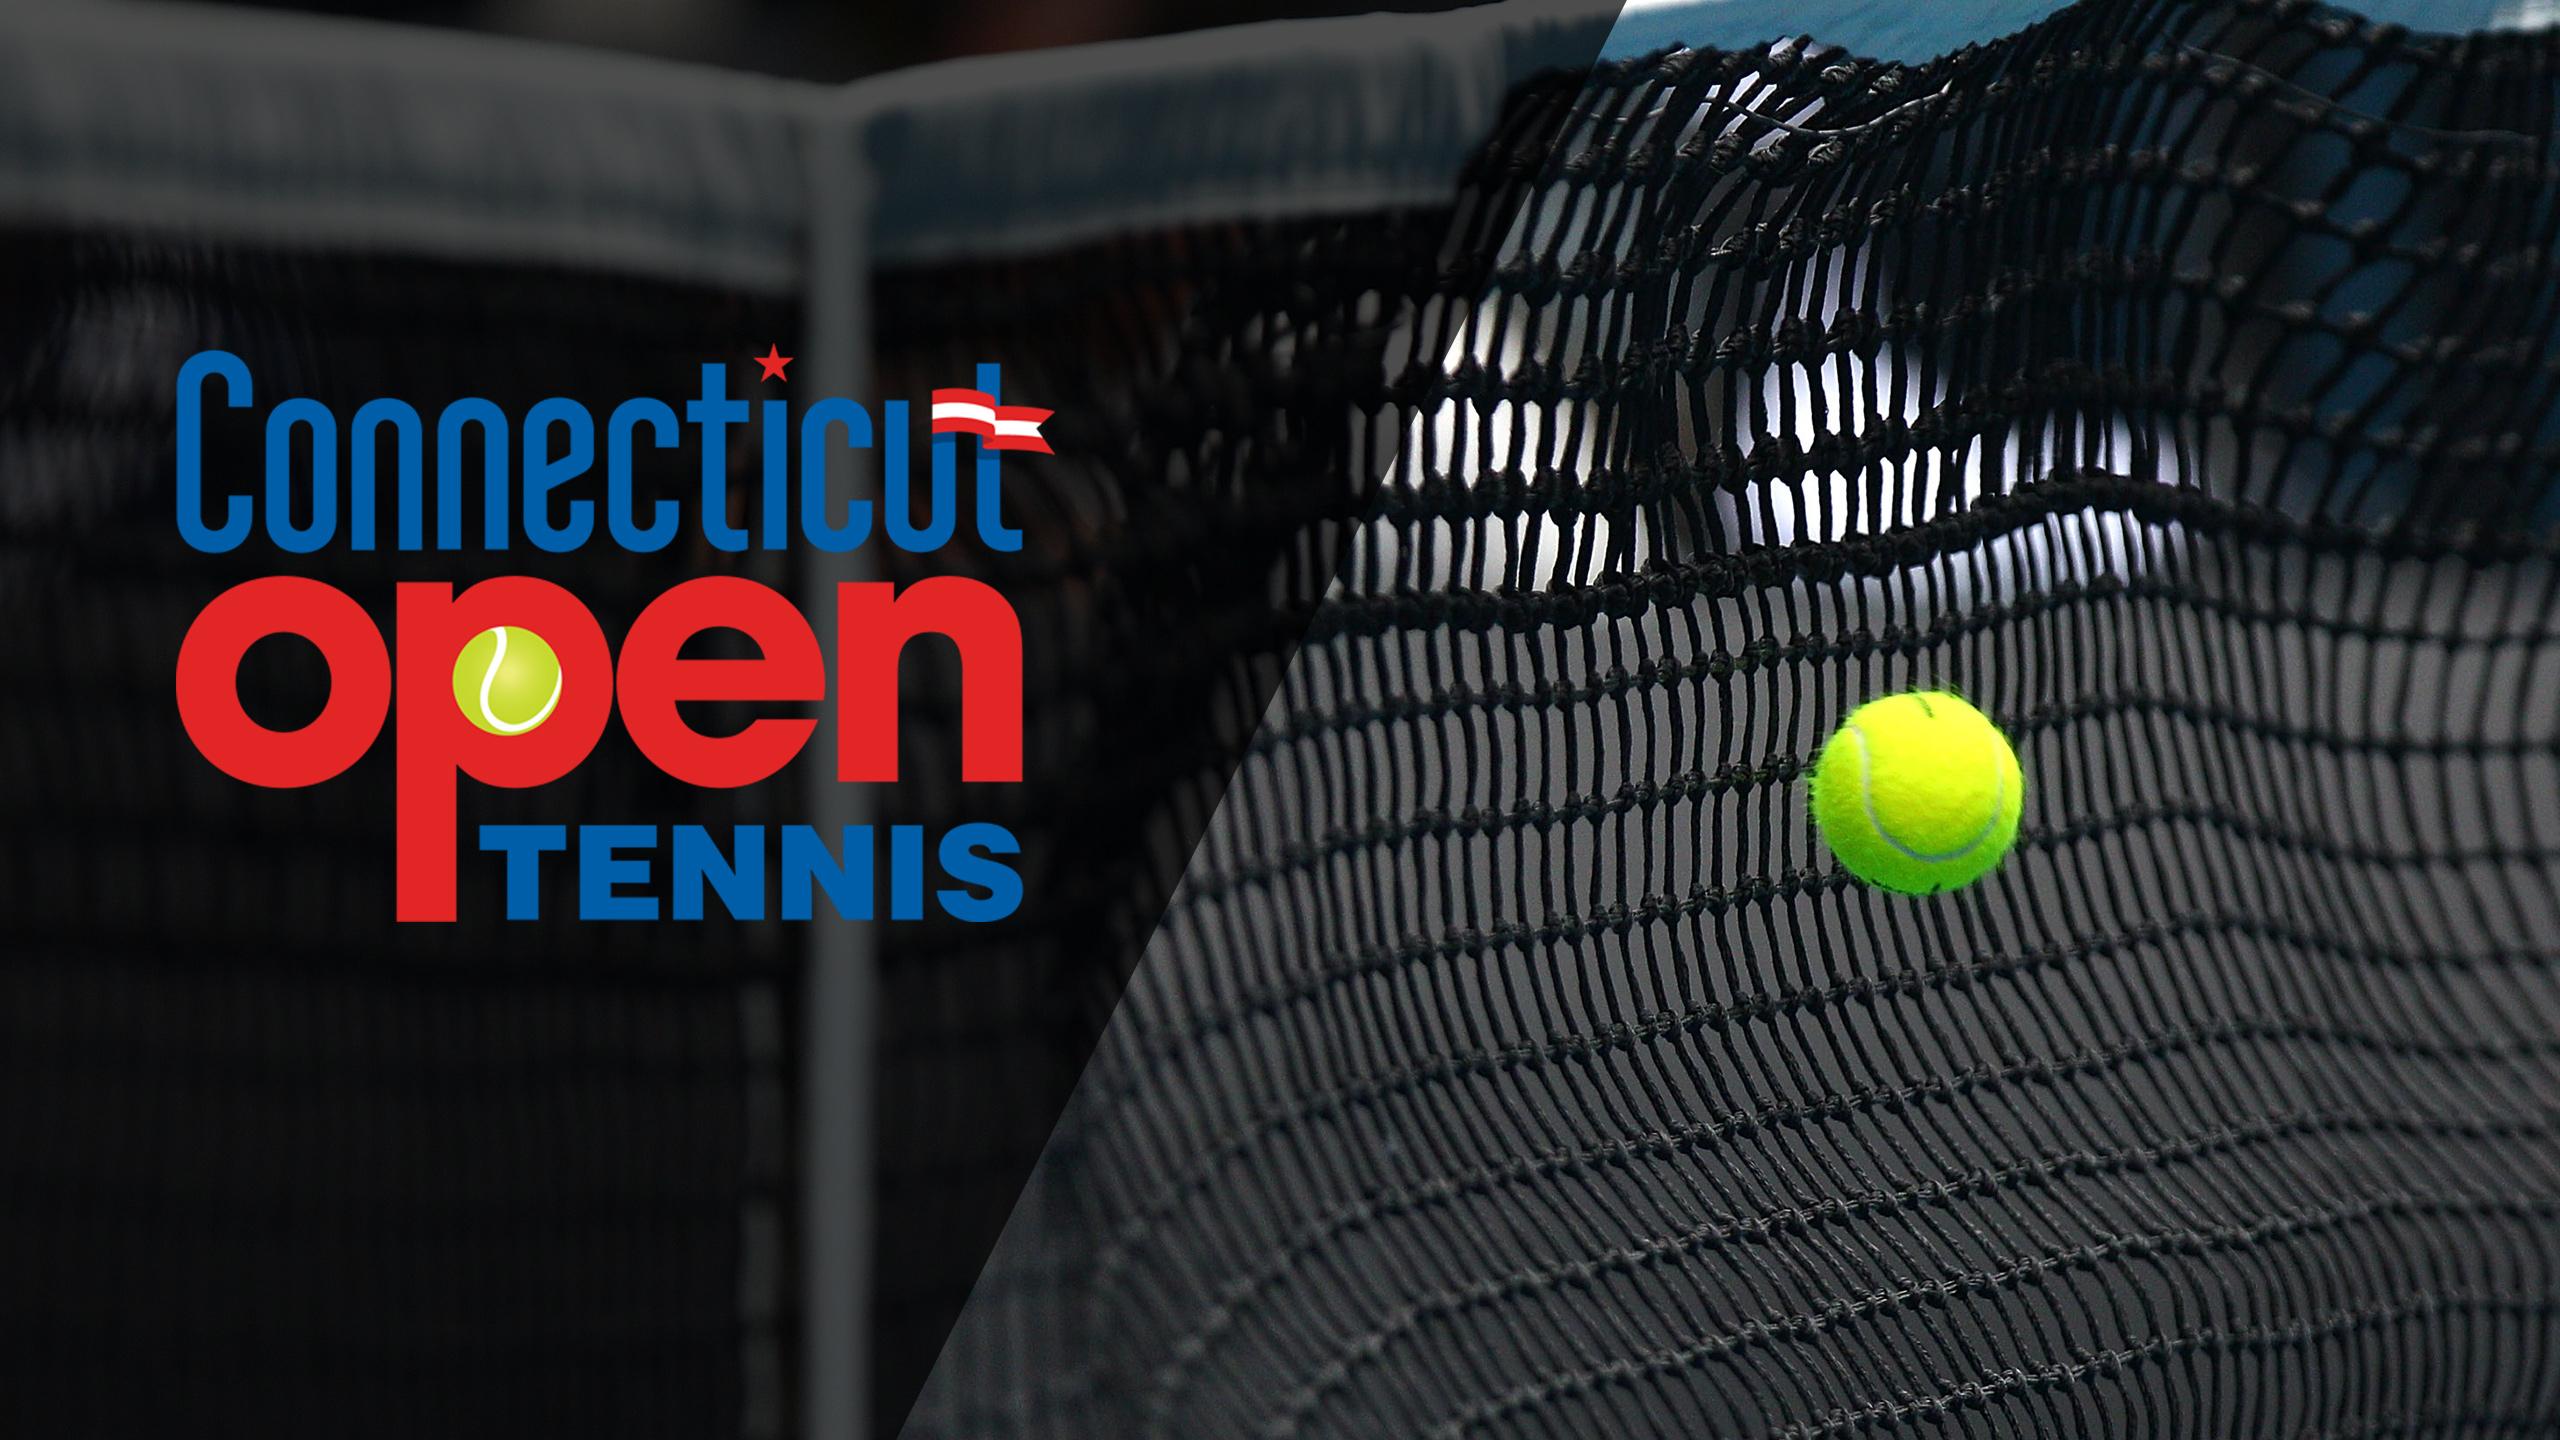 2018 US Open Series - Connecticut Open (Semifinal #2)